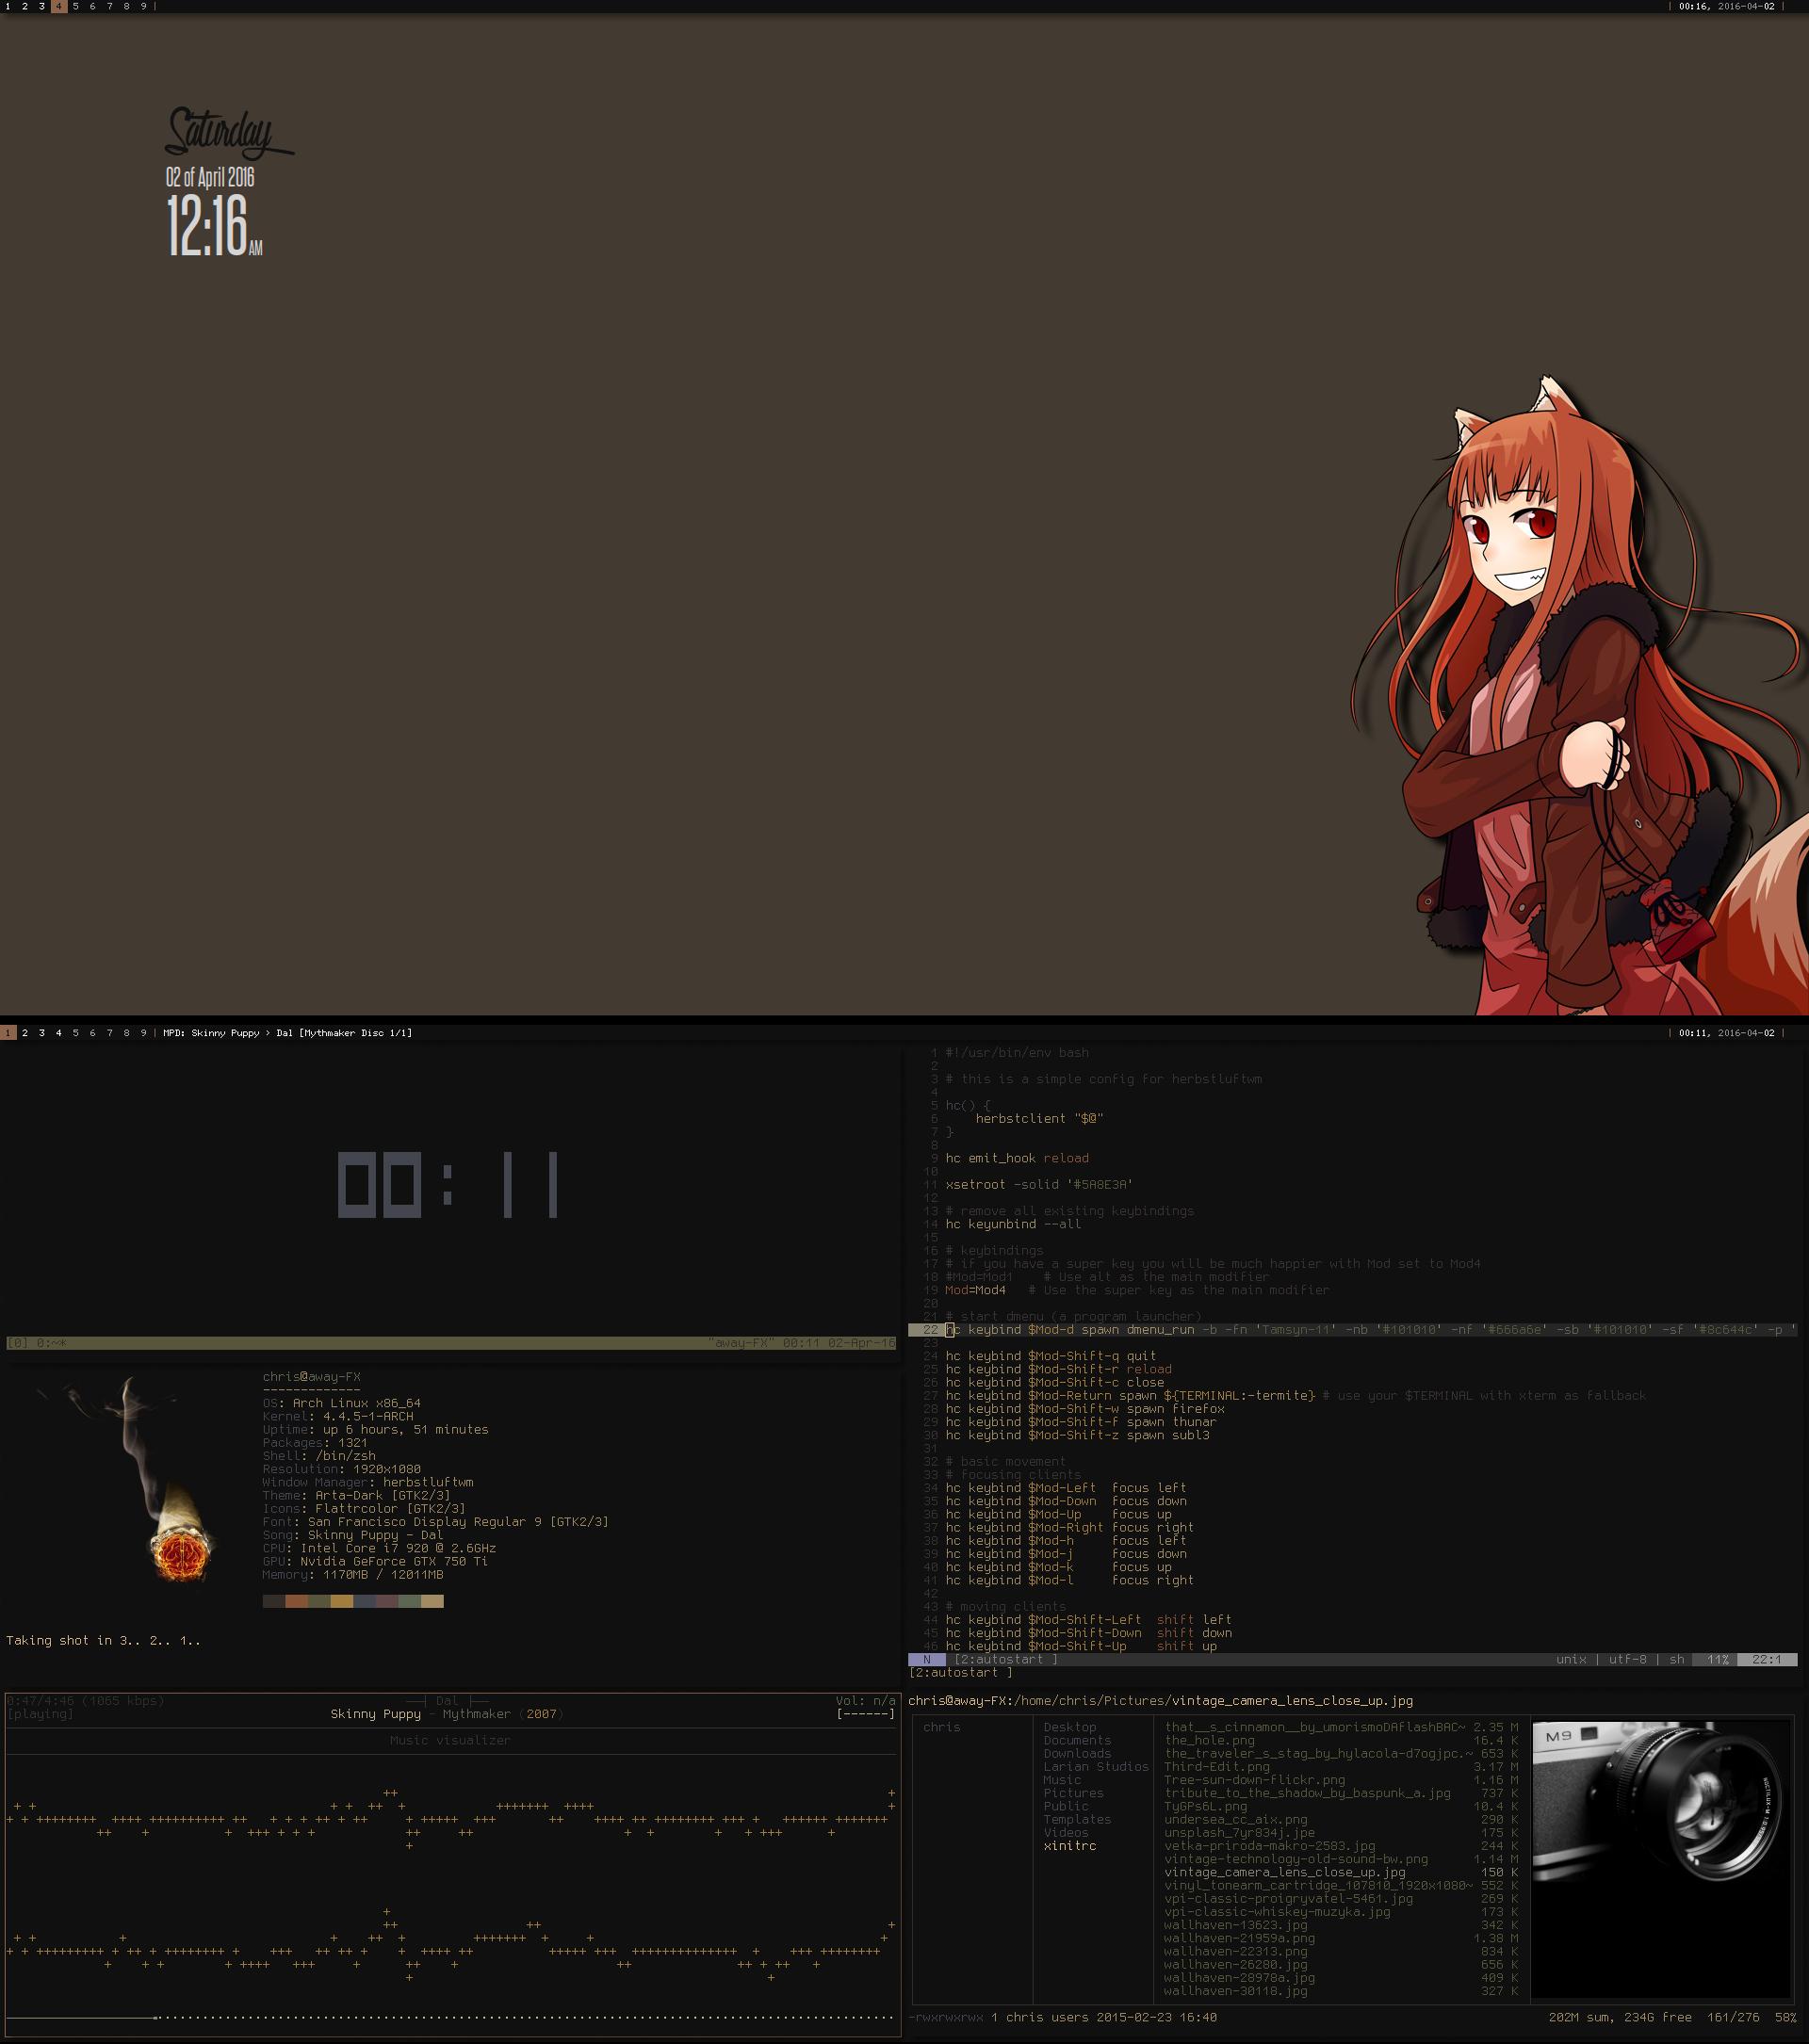 Arch + Herbstluftwm 4.2016 by chriptik